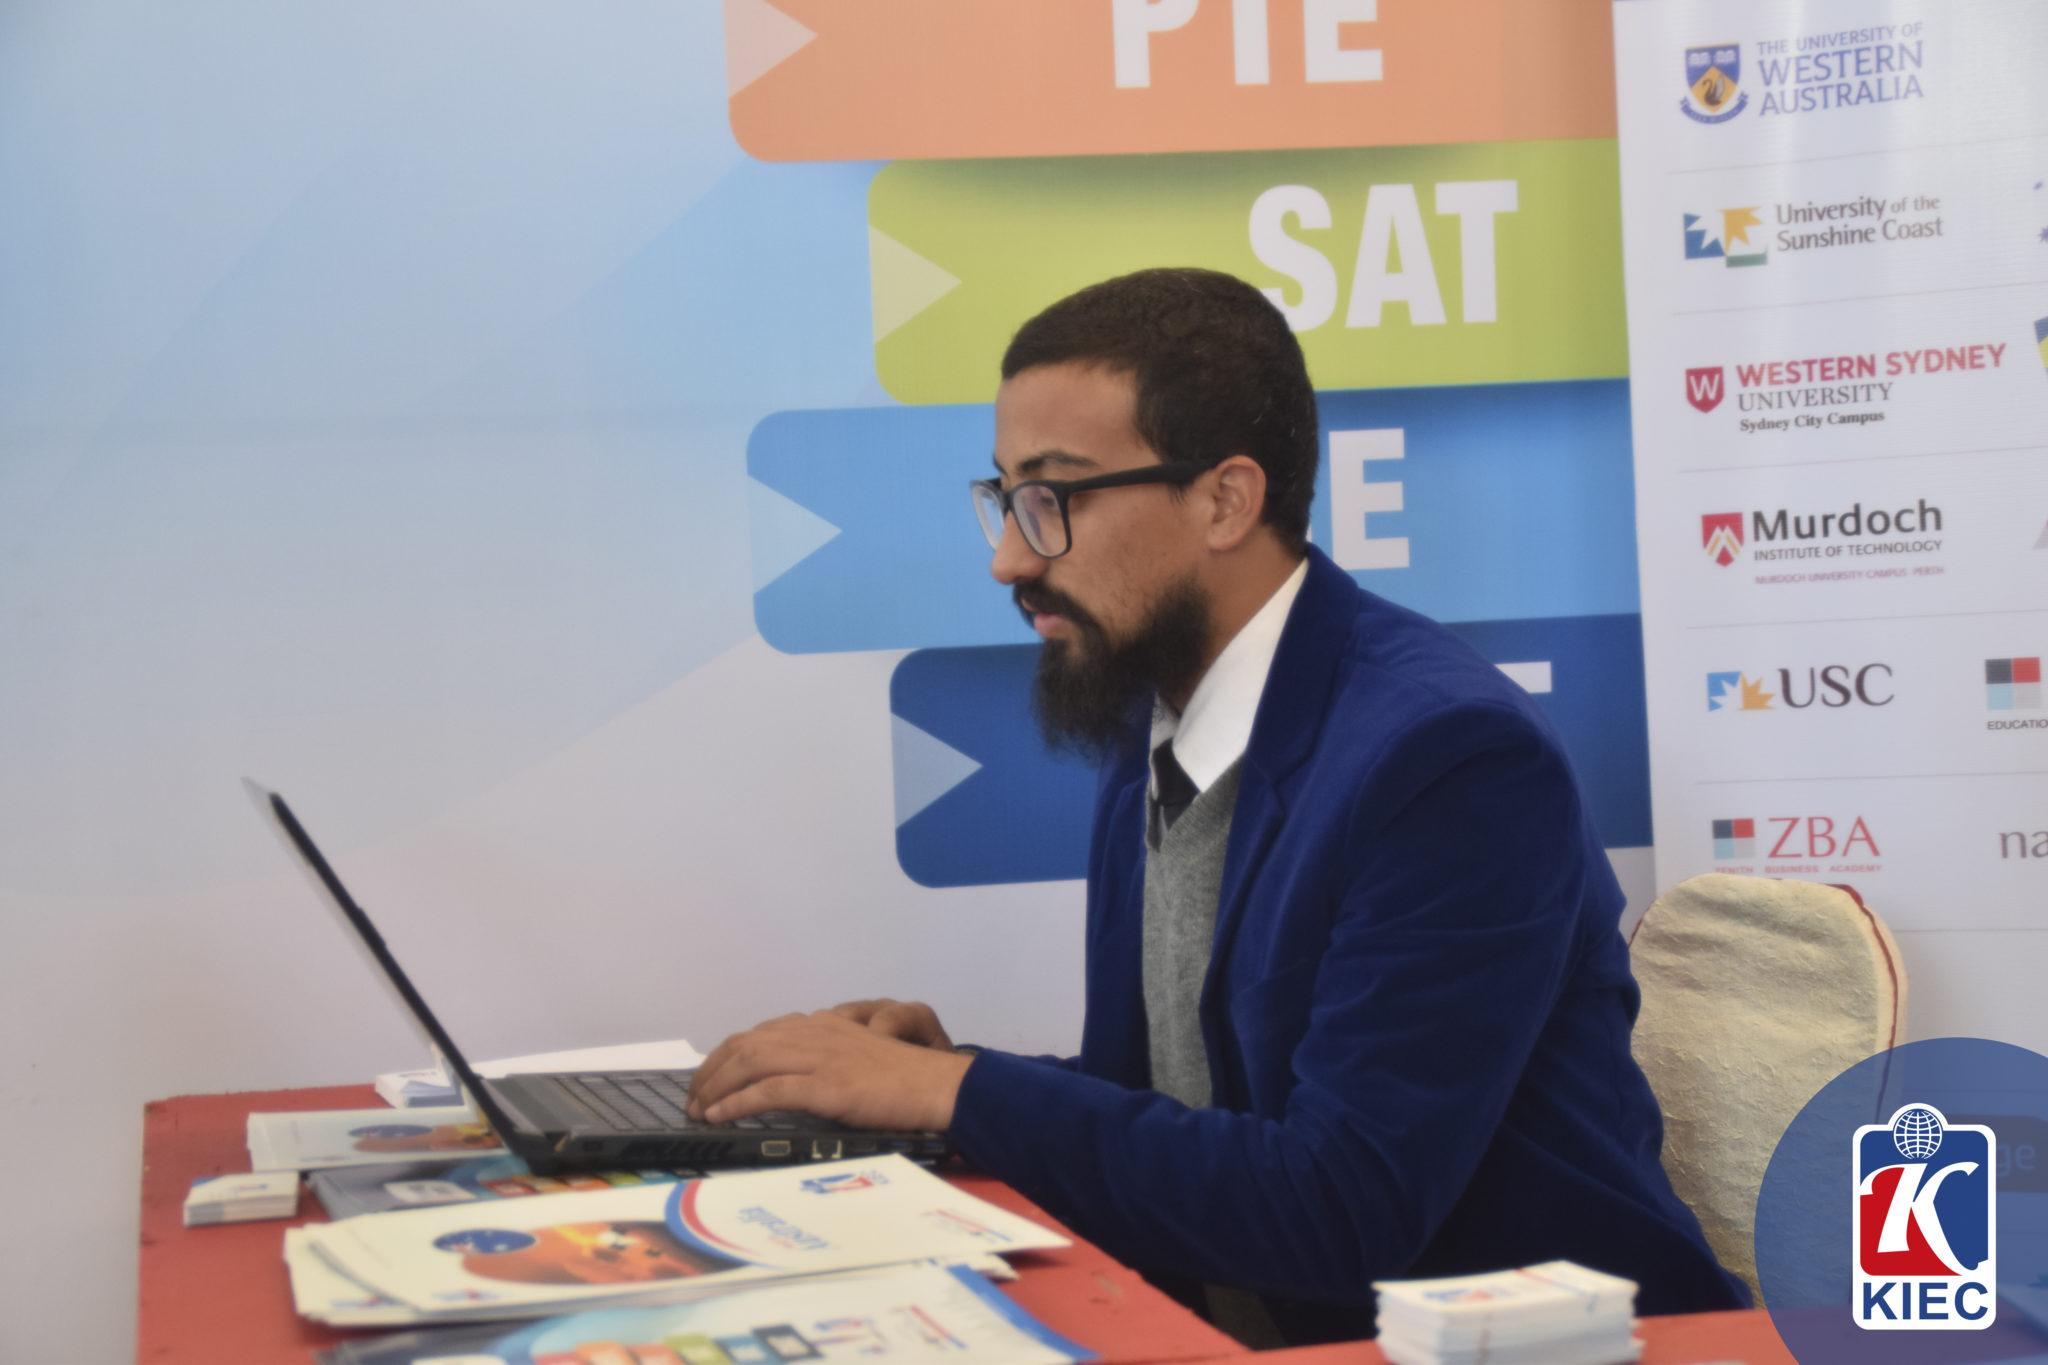 Counsellor Amod Khadka